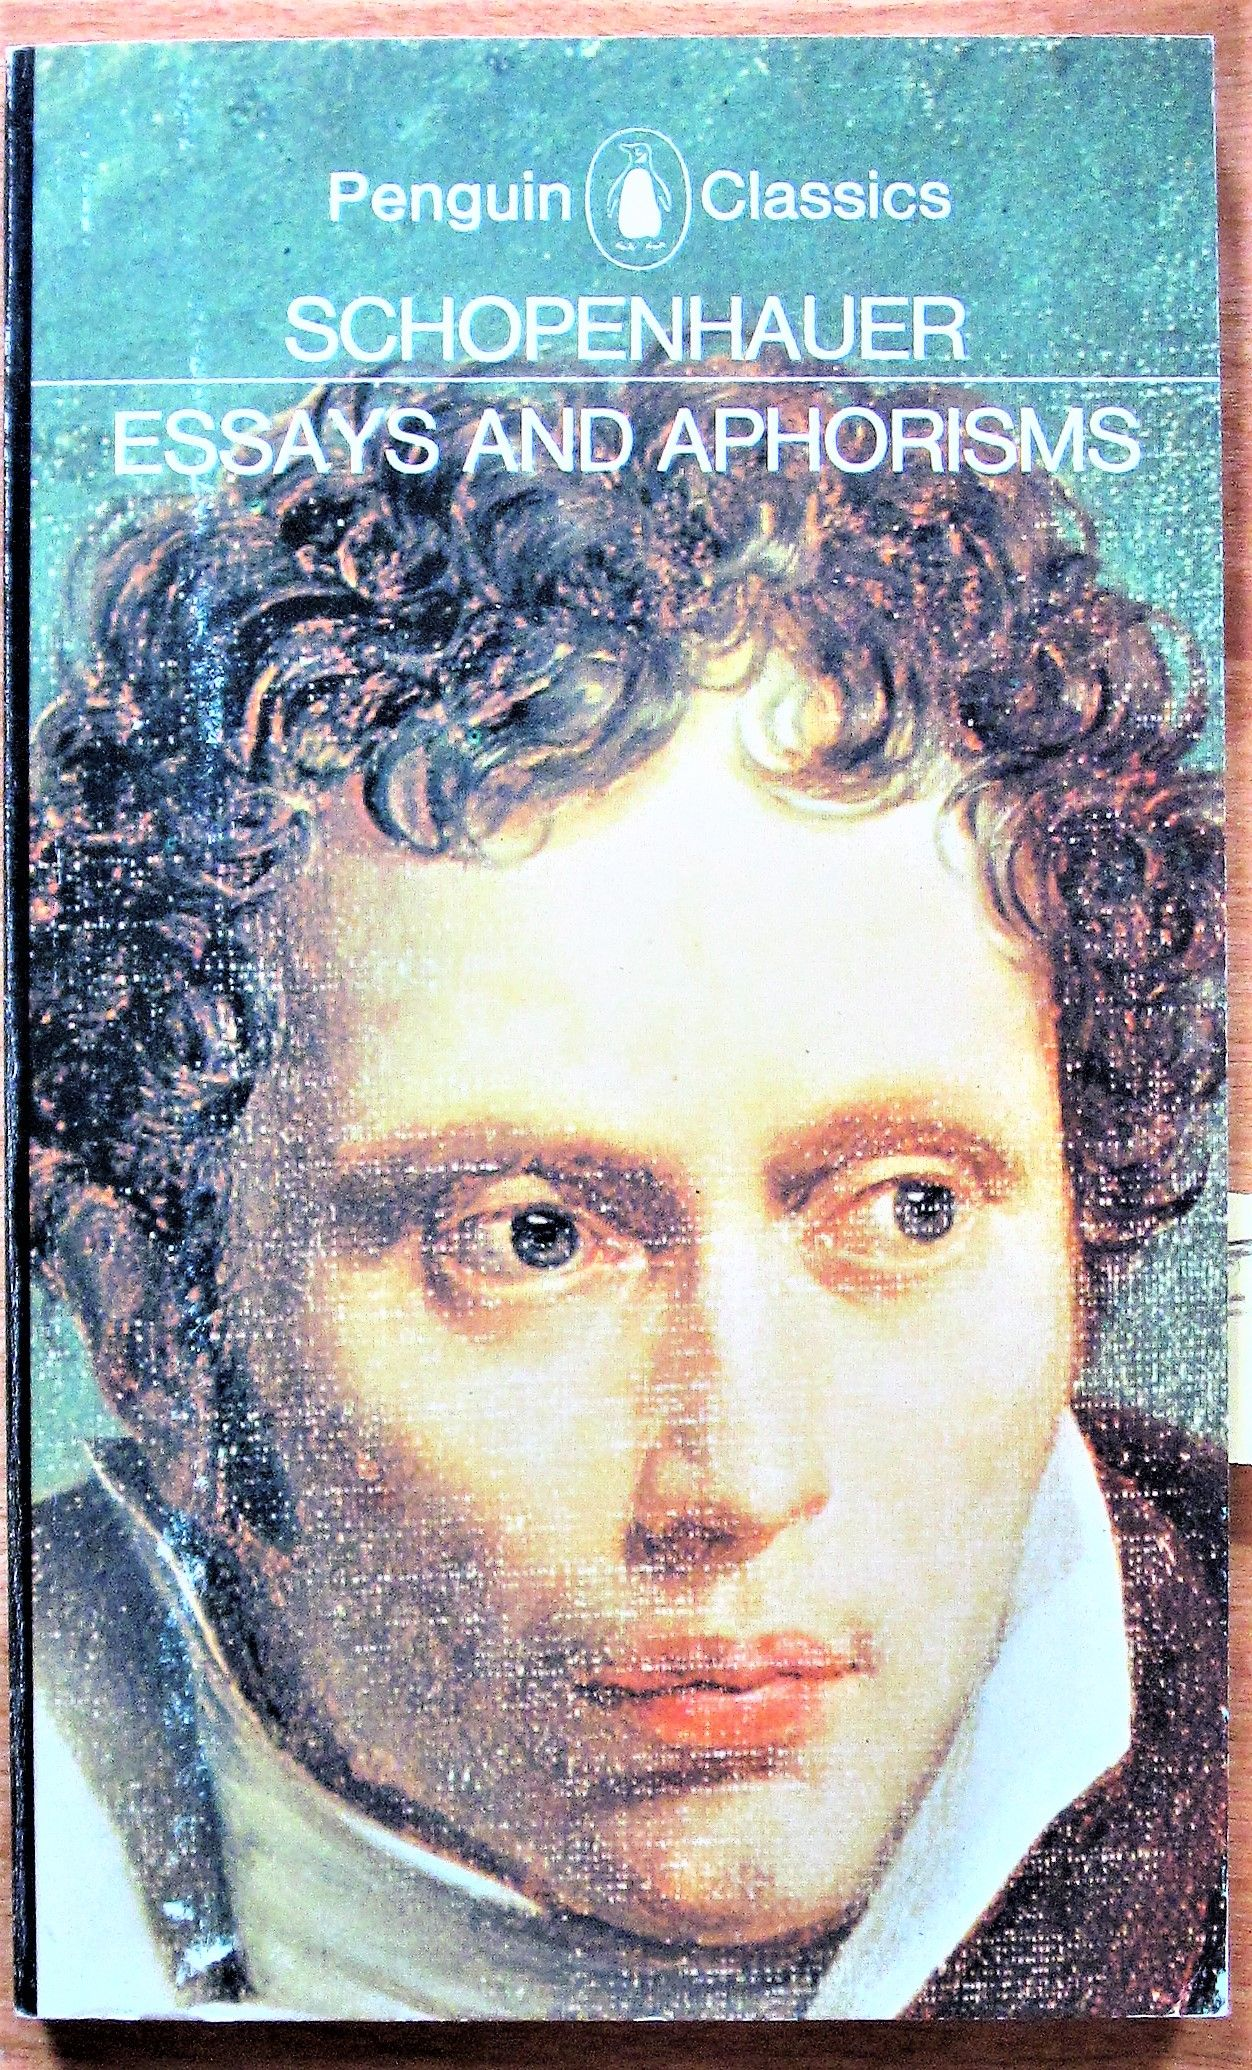 003 Essays And Aphorisms X Essay Frightening Pdf Schopenhauer Full